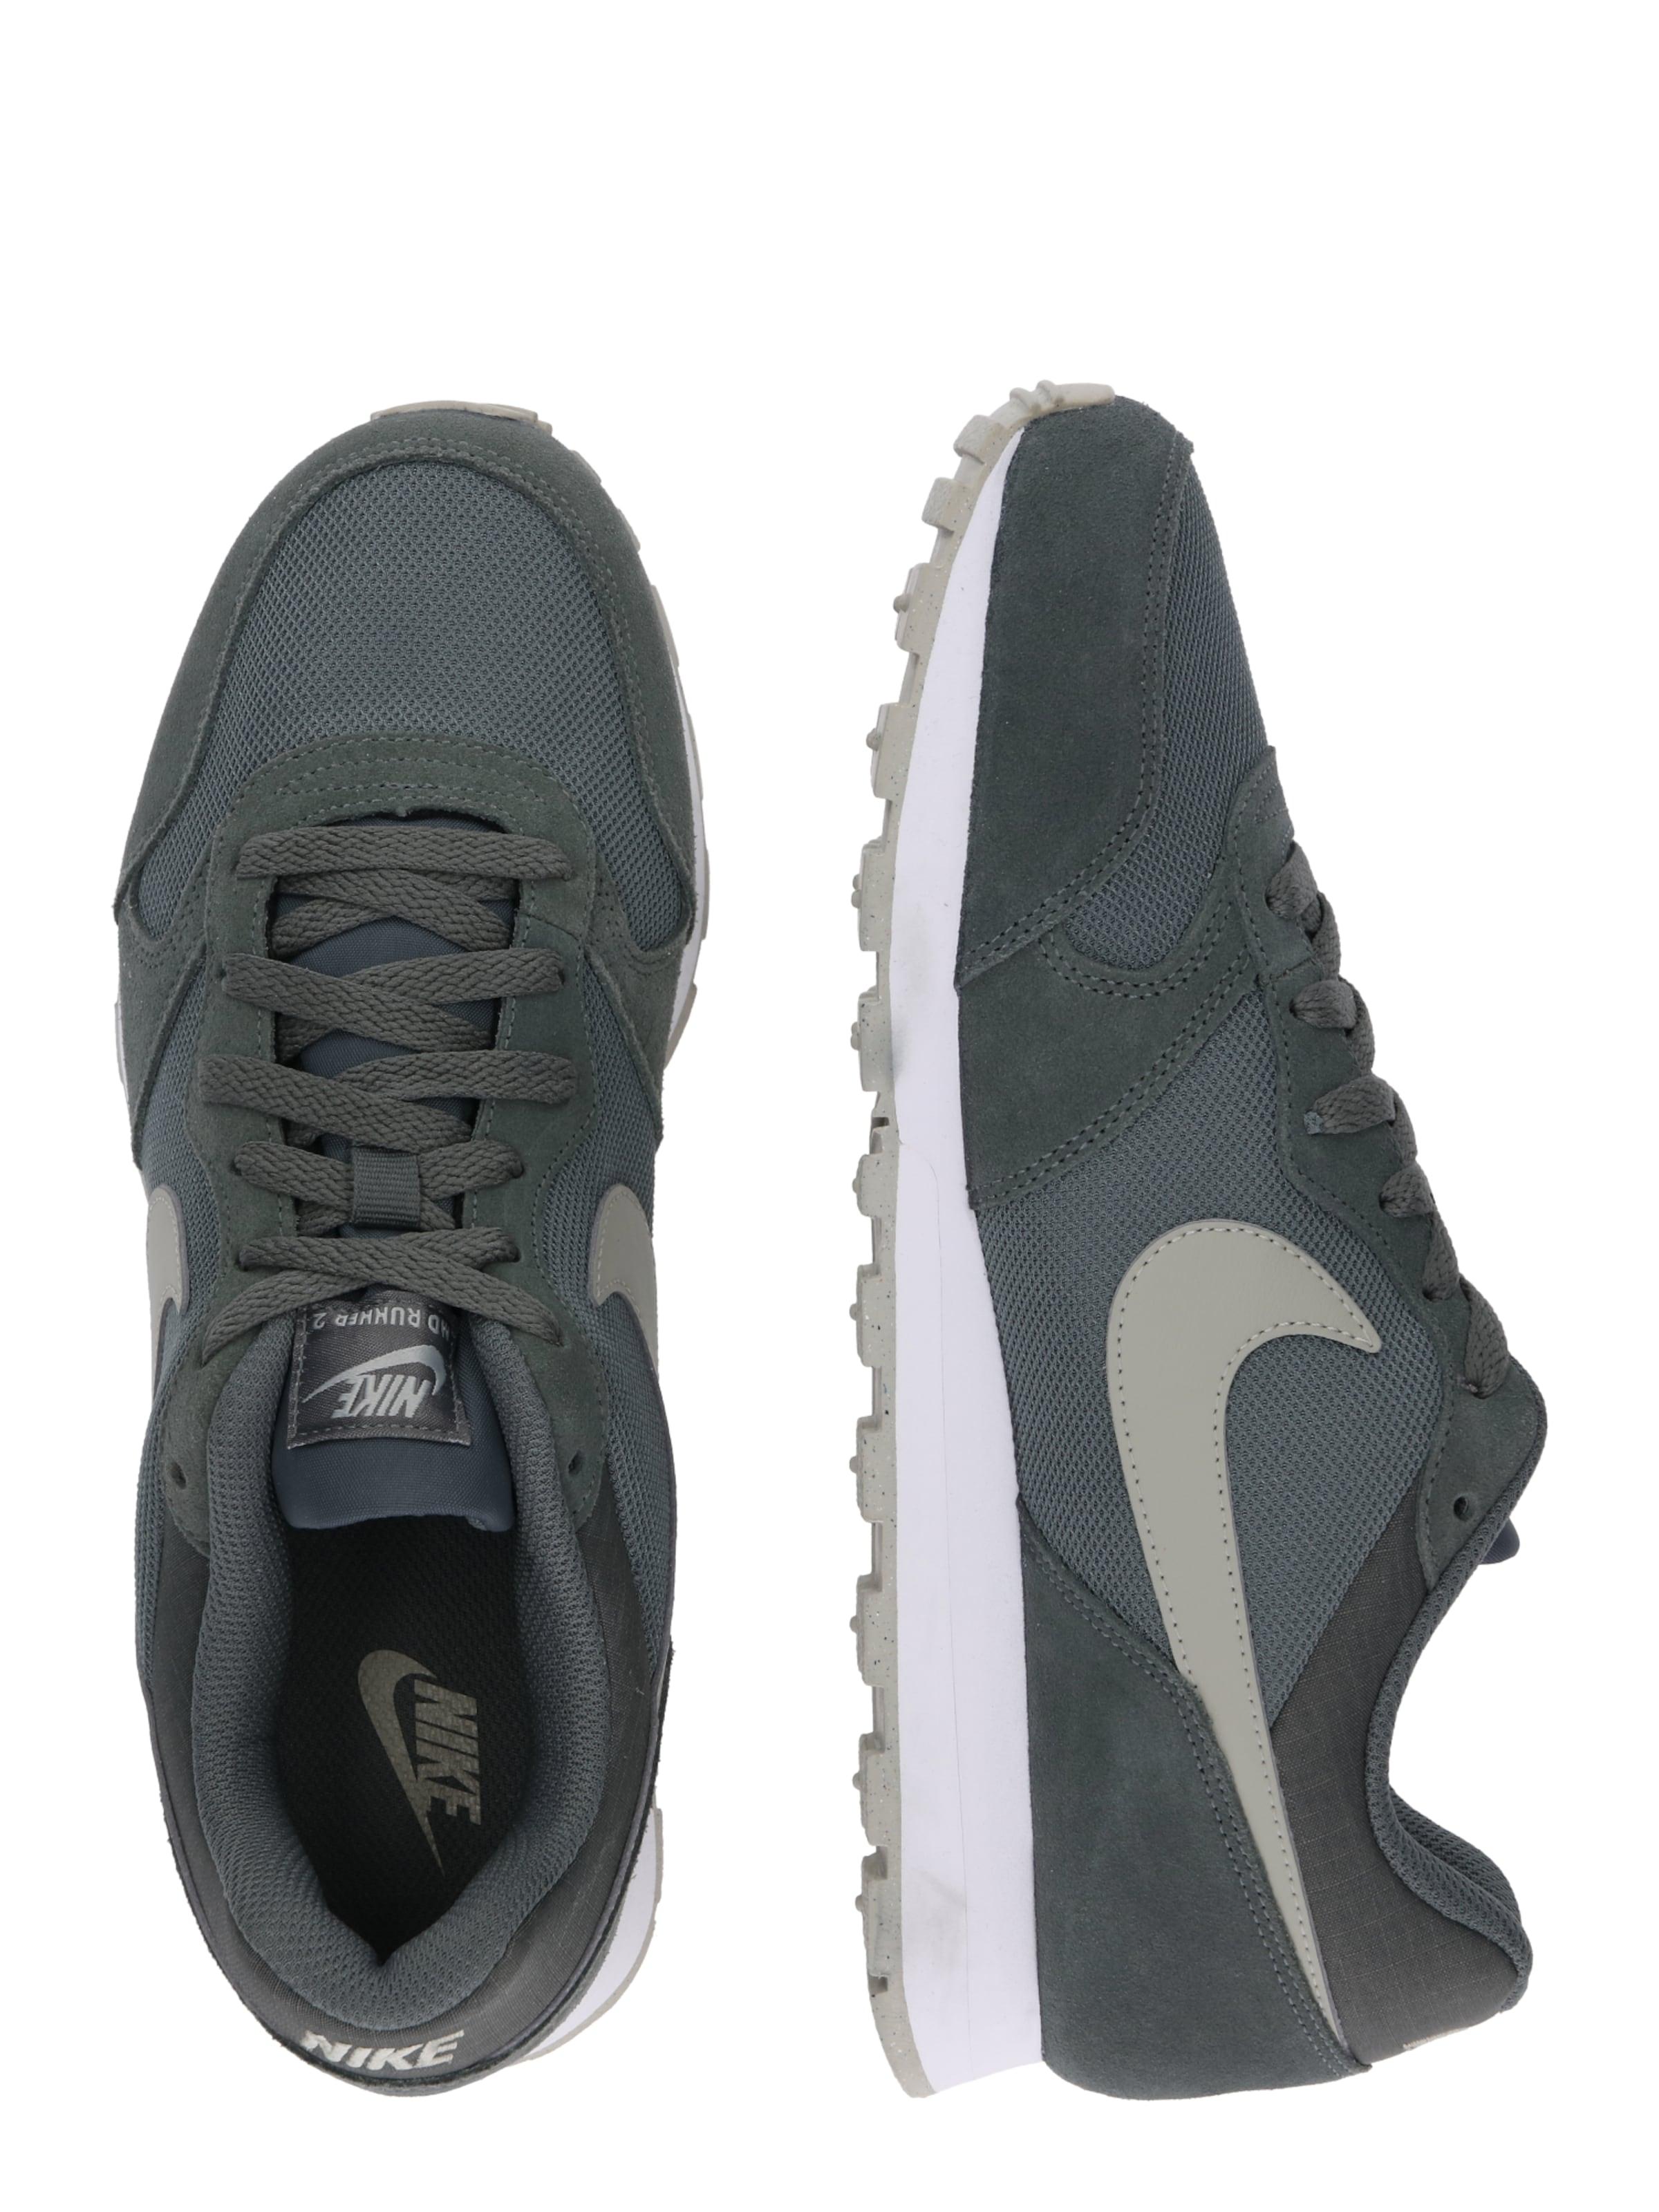 'runner Dunkelgrau In Nike Sportswear 2' Sneaker QxhrdsoCtB